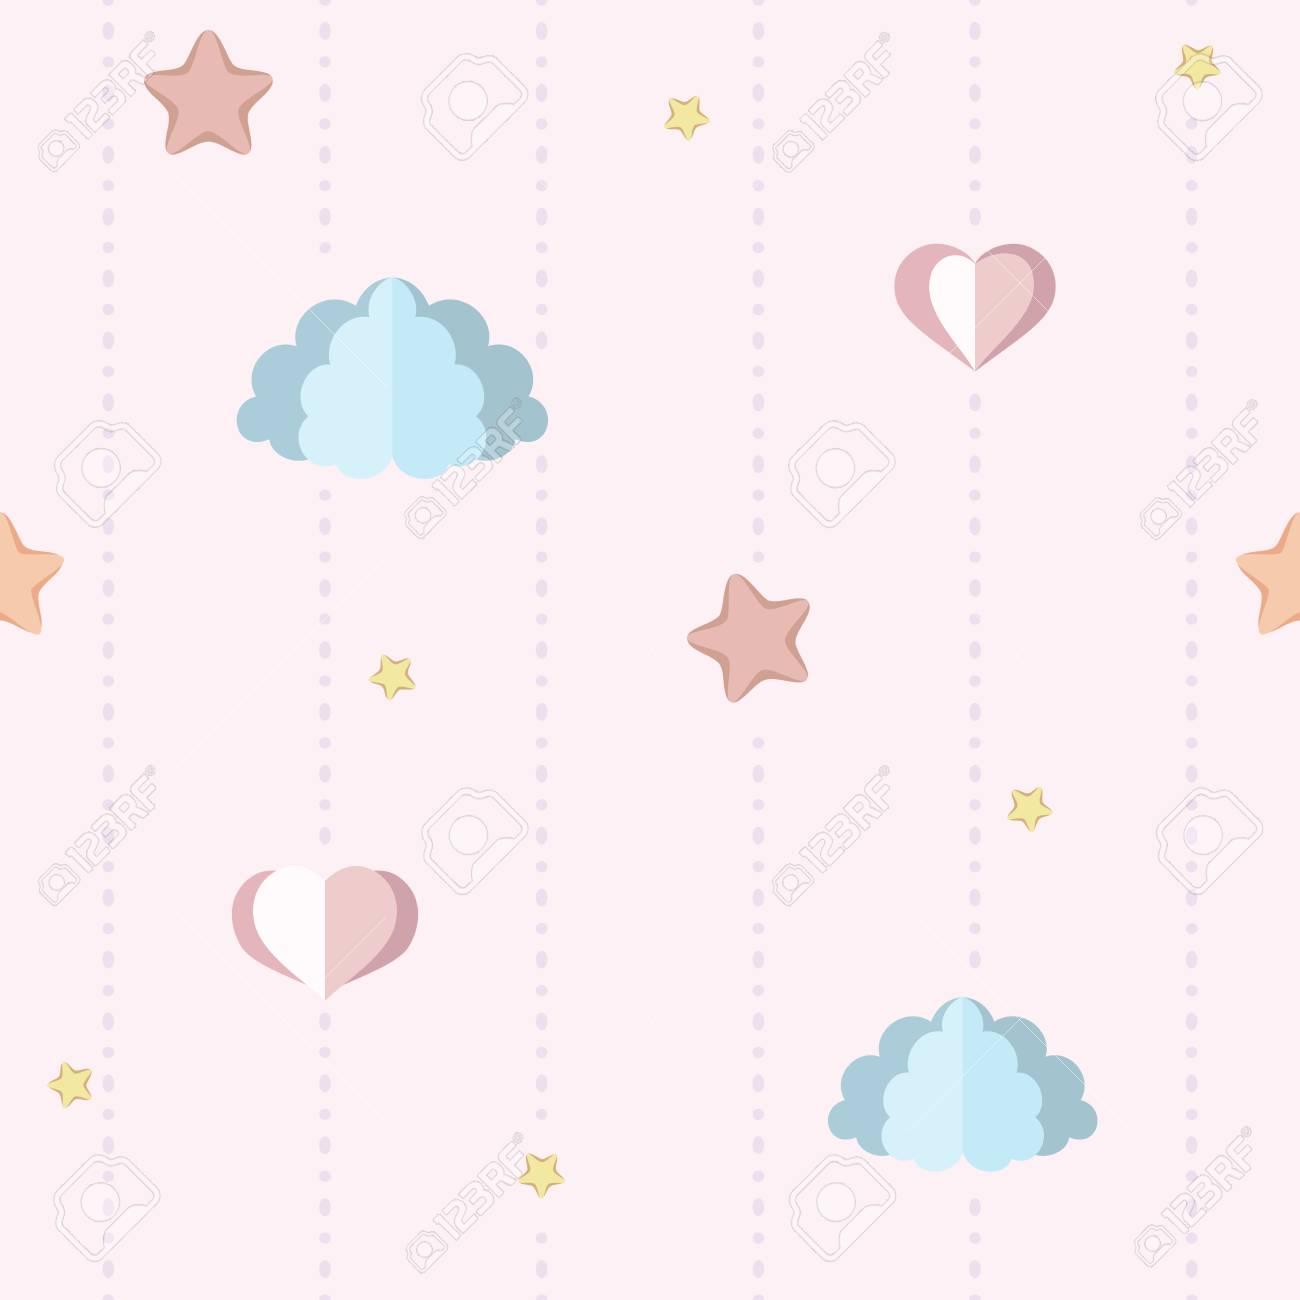 Cute Nursery Children S Bedroom Wallpaper With Paper Clouds